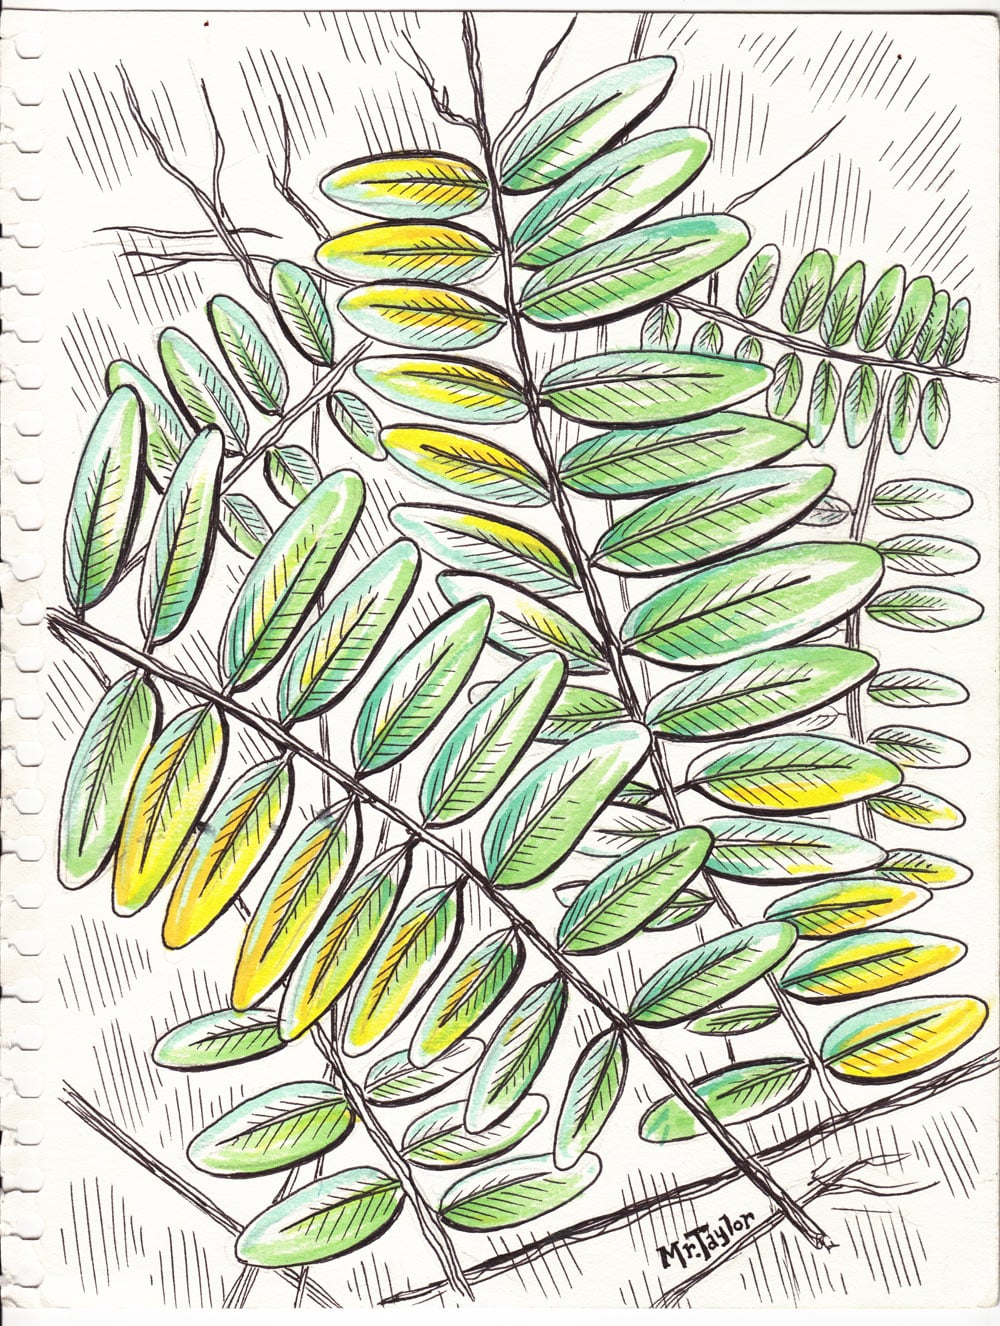 mrtaylor-honeylocust-sketch.jpg